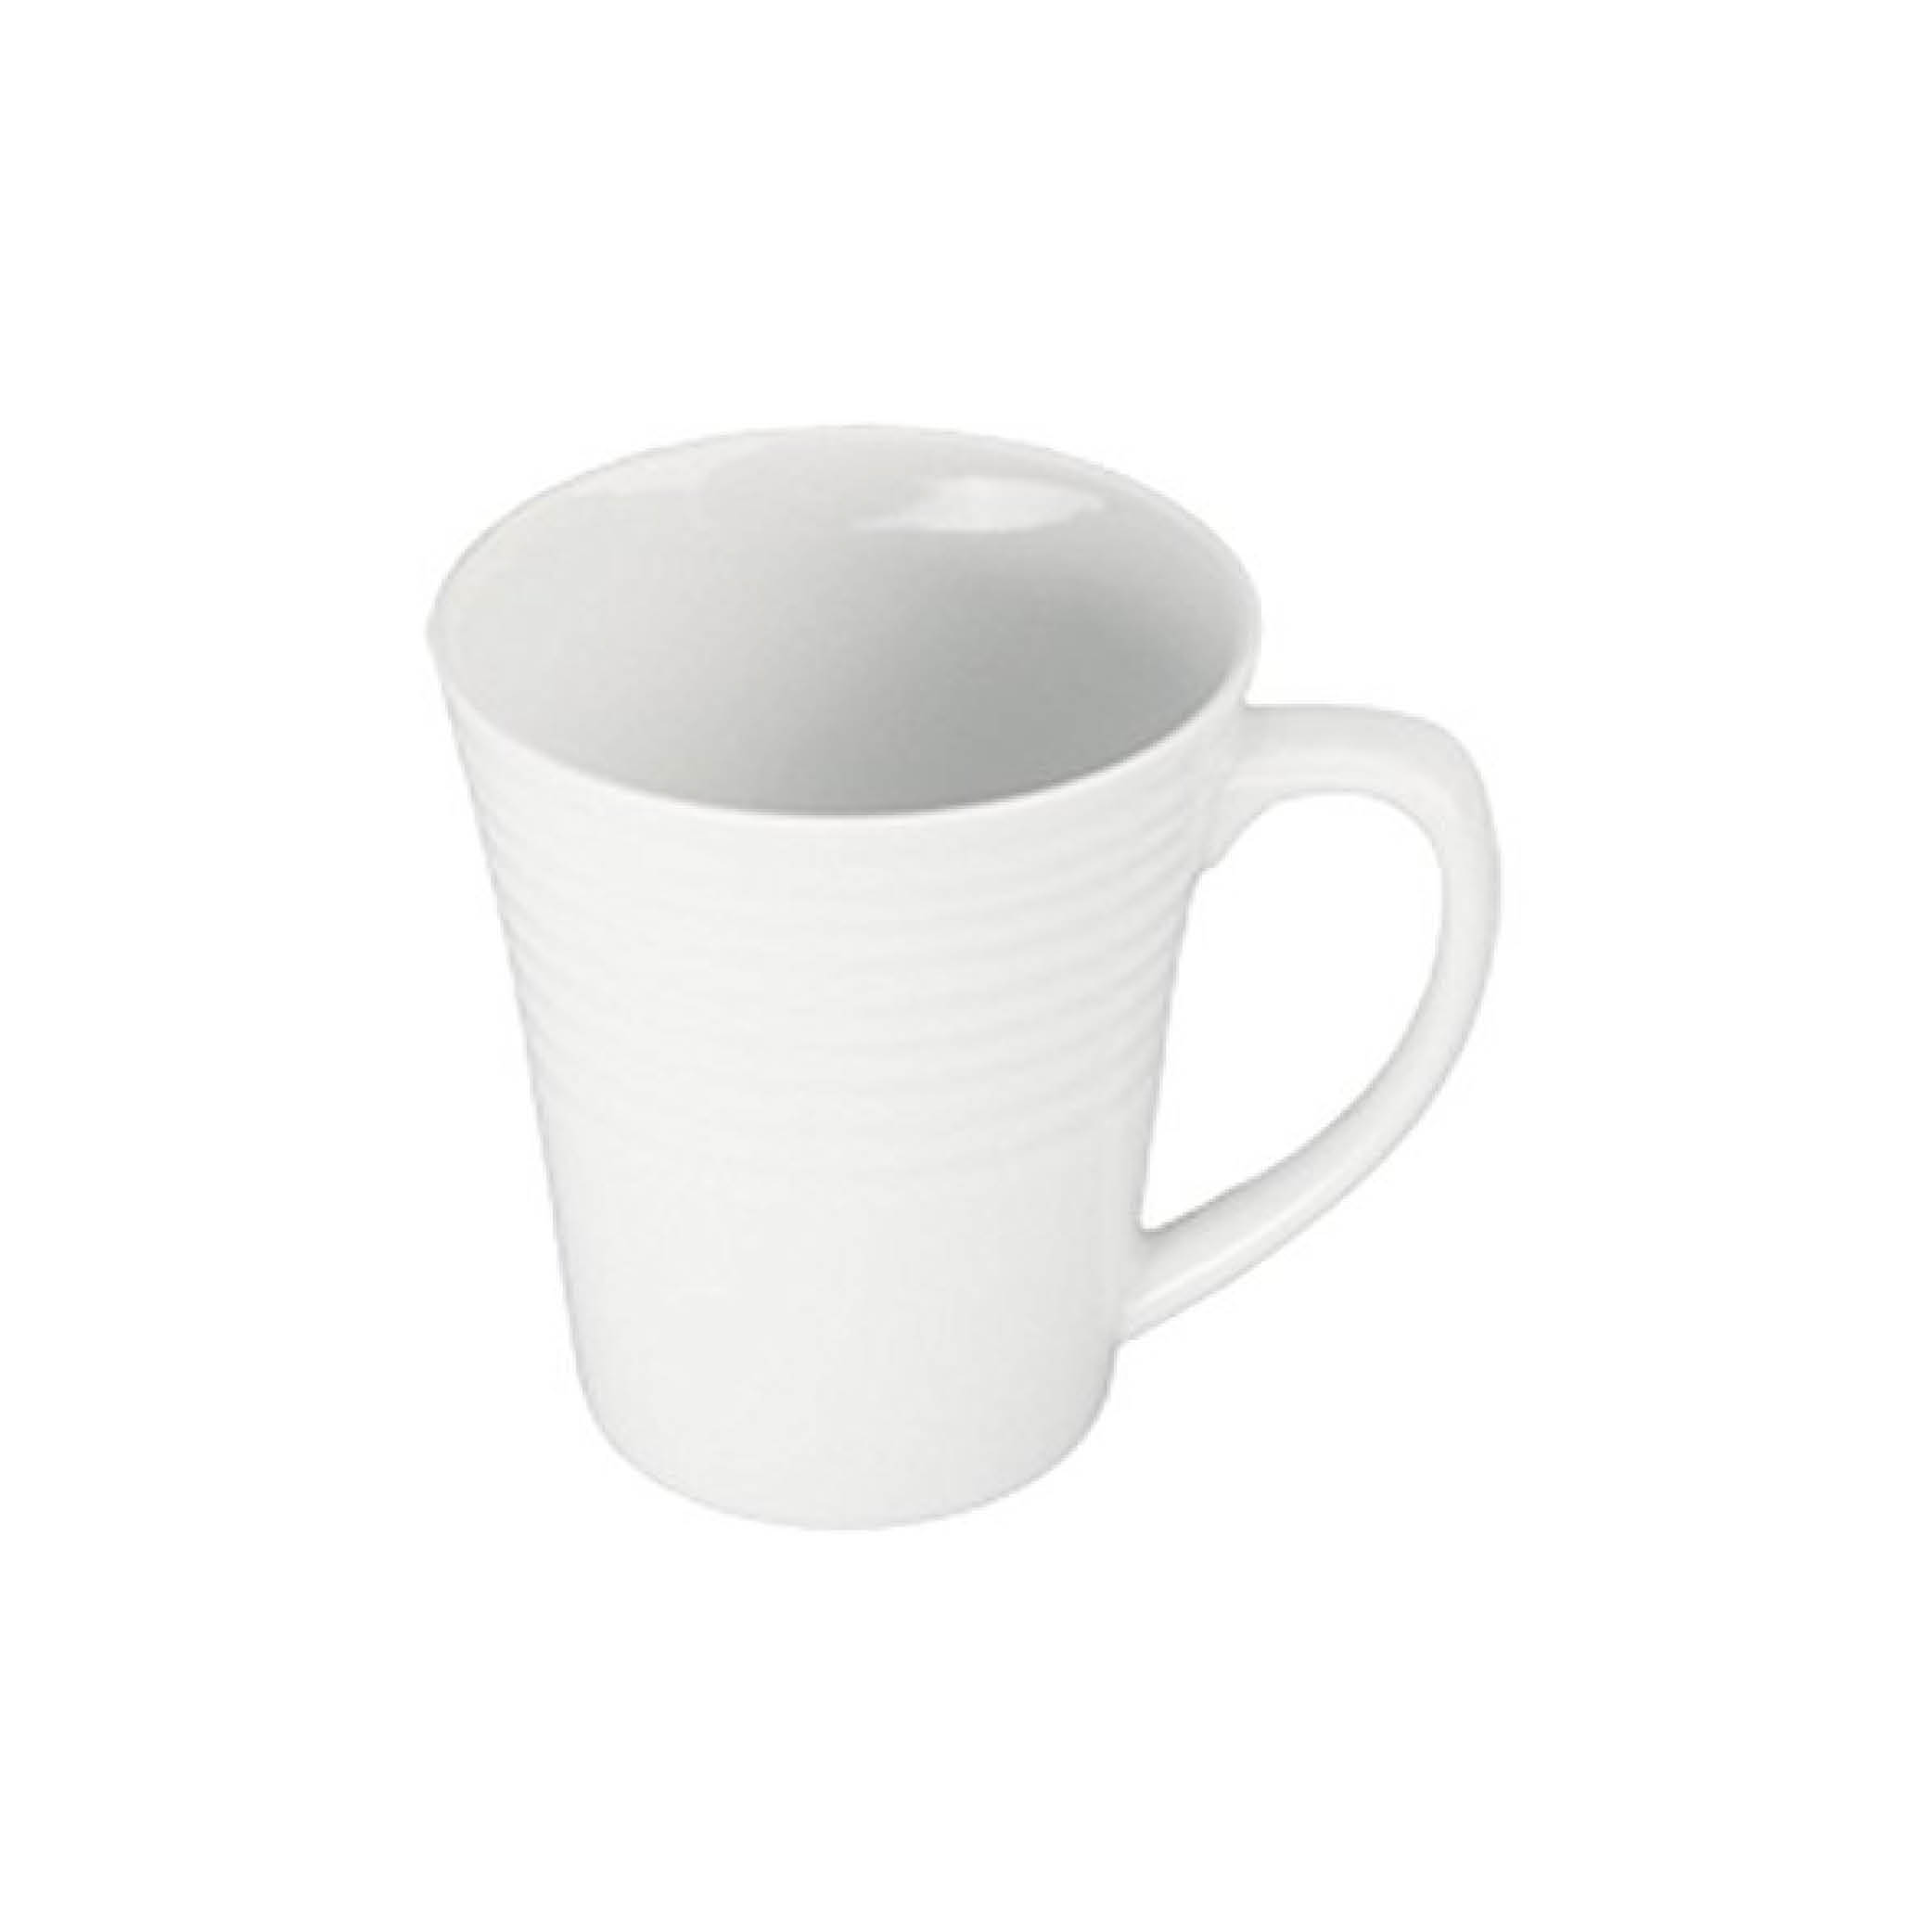 Ribbed White Coffee Mug $6.95   Wants 8 Has 2 Needs 6